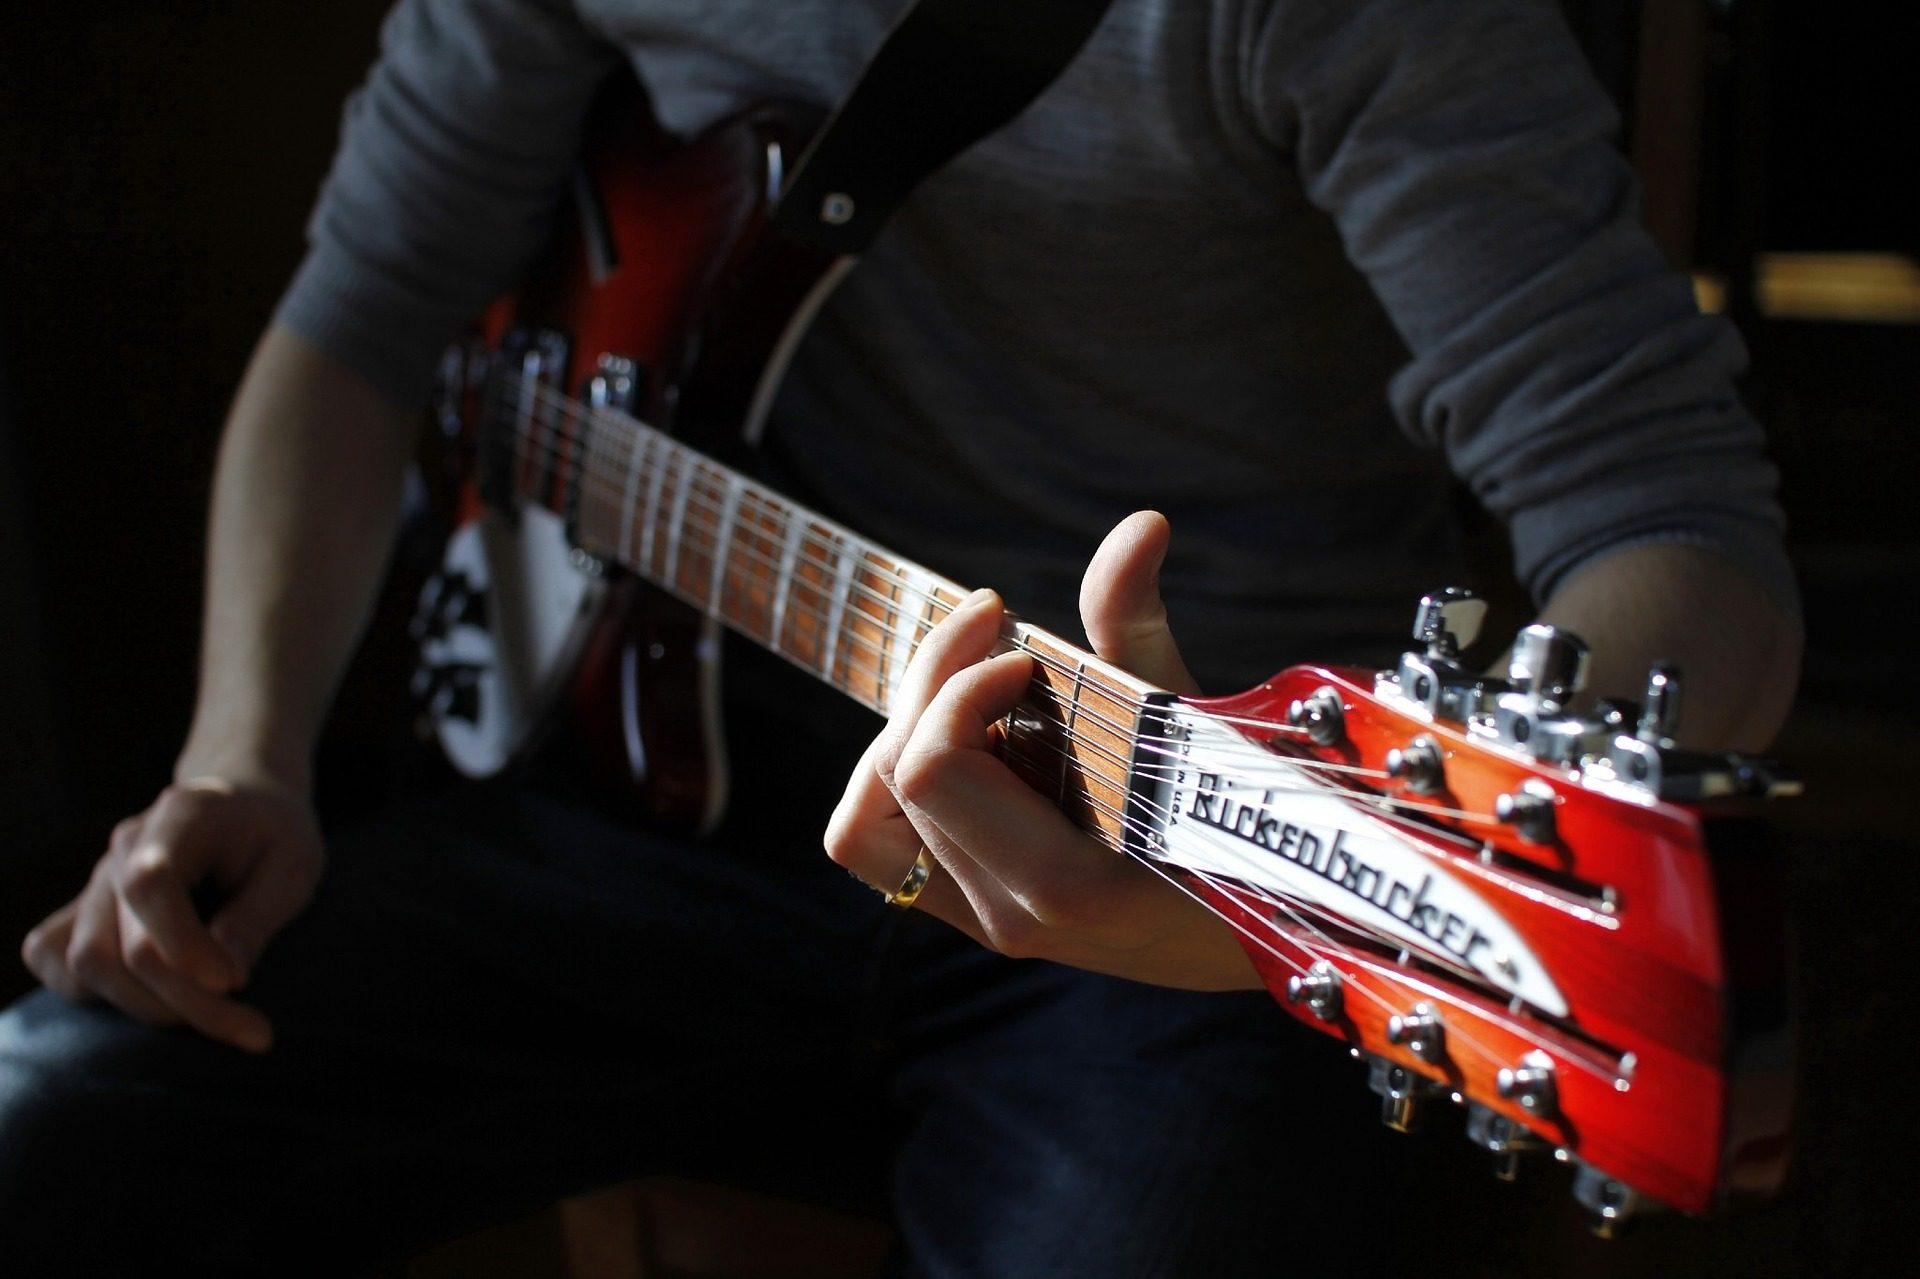 Гитара, электрические, Мачта, строки, Rickenbacker - Обои HD - Профессор falken.com